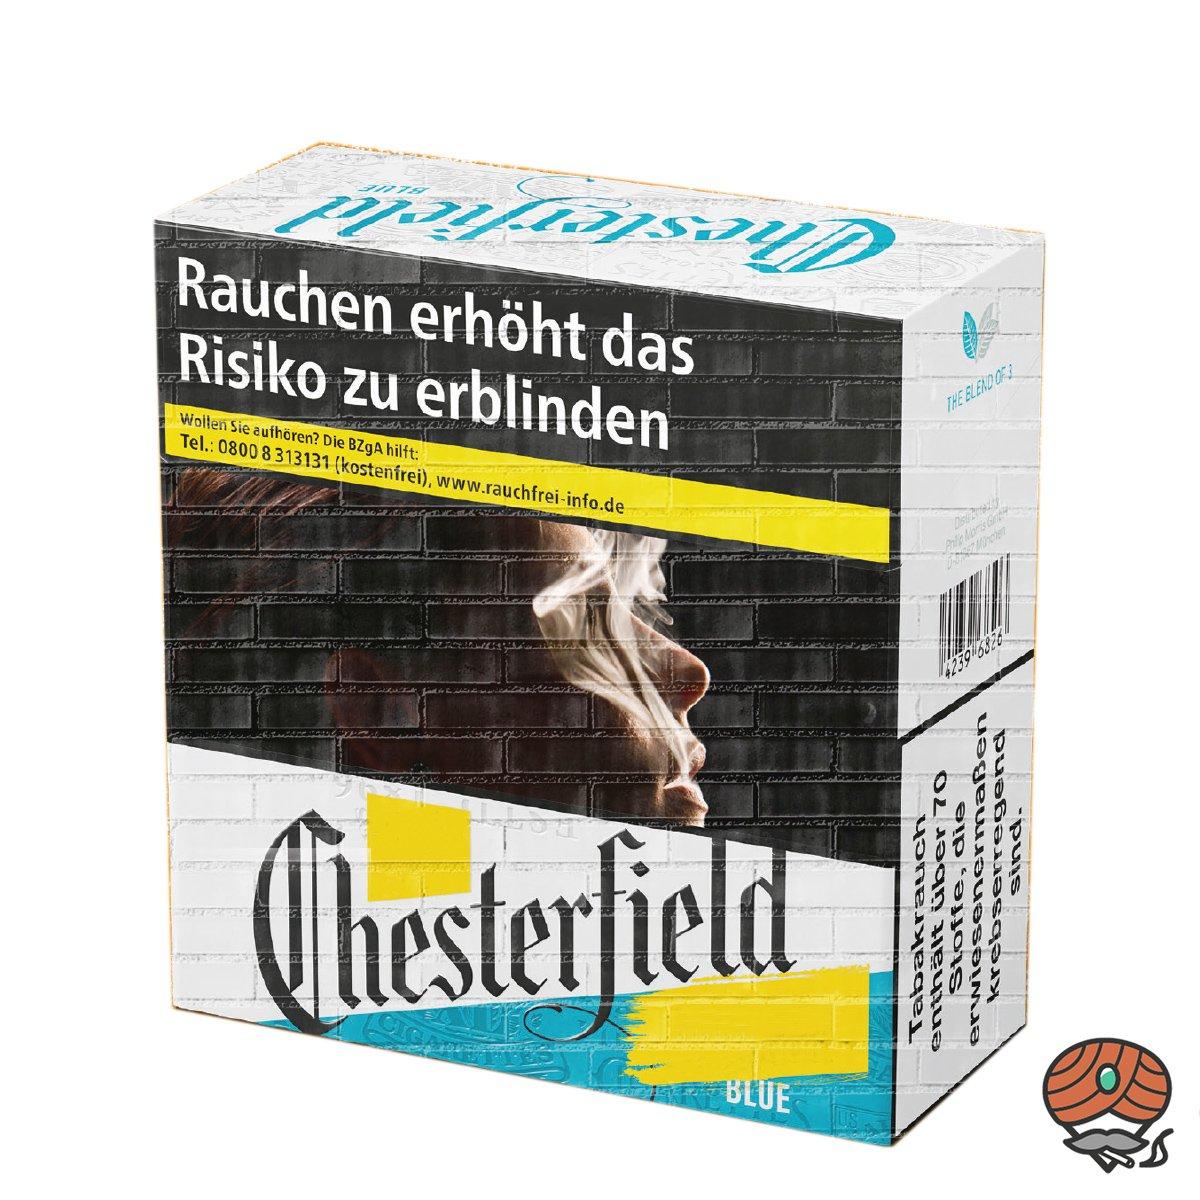 Chesterfield BLUE / BLAU Zigaretten - 47 Stück